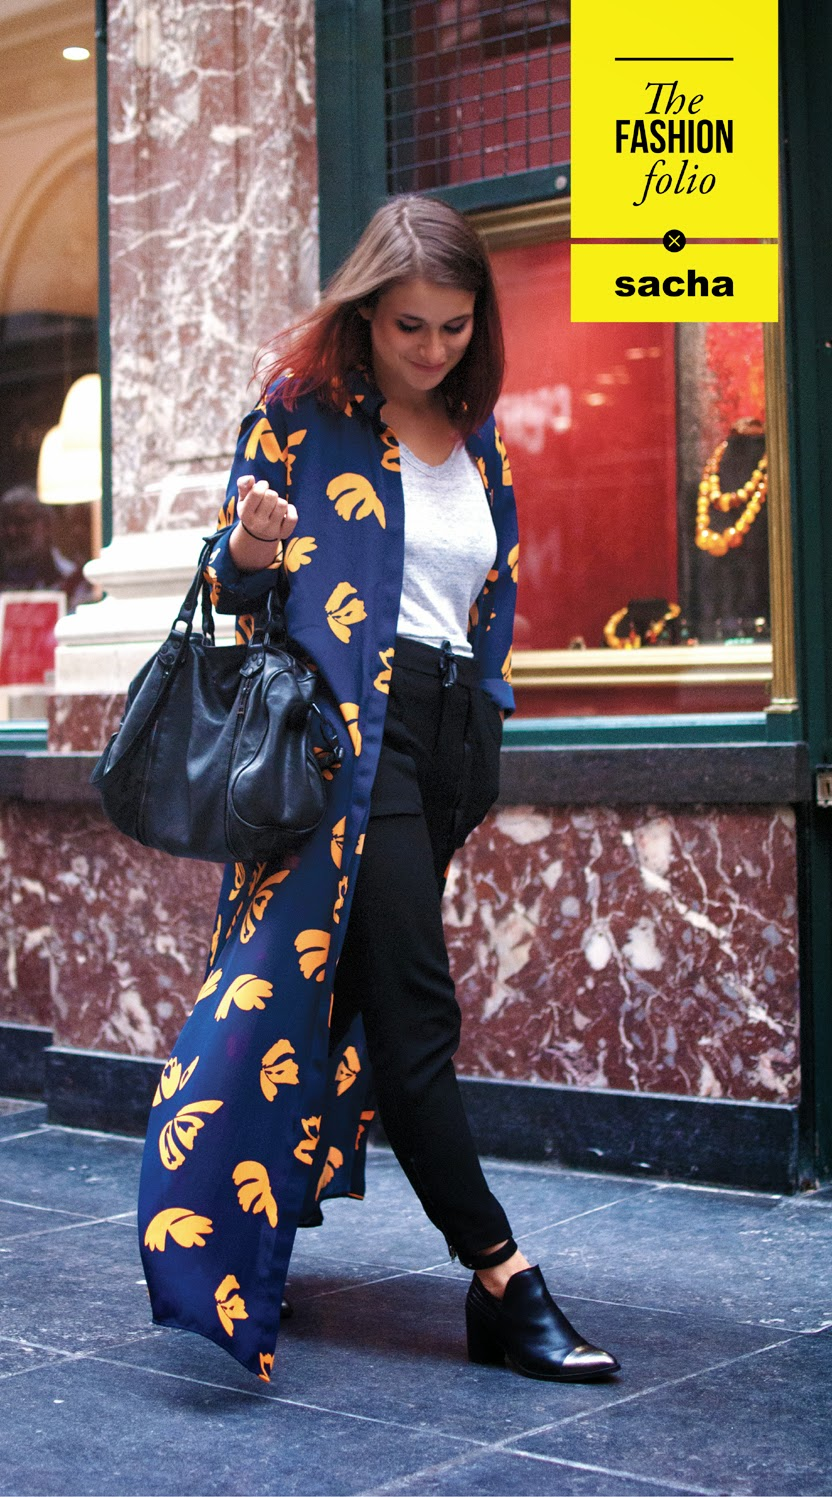 The Fashion Folio, Sacha, Sacha Shoes, Blog, Collab, Collection, Shoe, Shoes, Antwerp, Belgium, Schoenen, Samenwerking, Fashion, Mode, Fashionblog, www.LaVieFleurit.com,